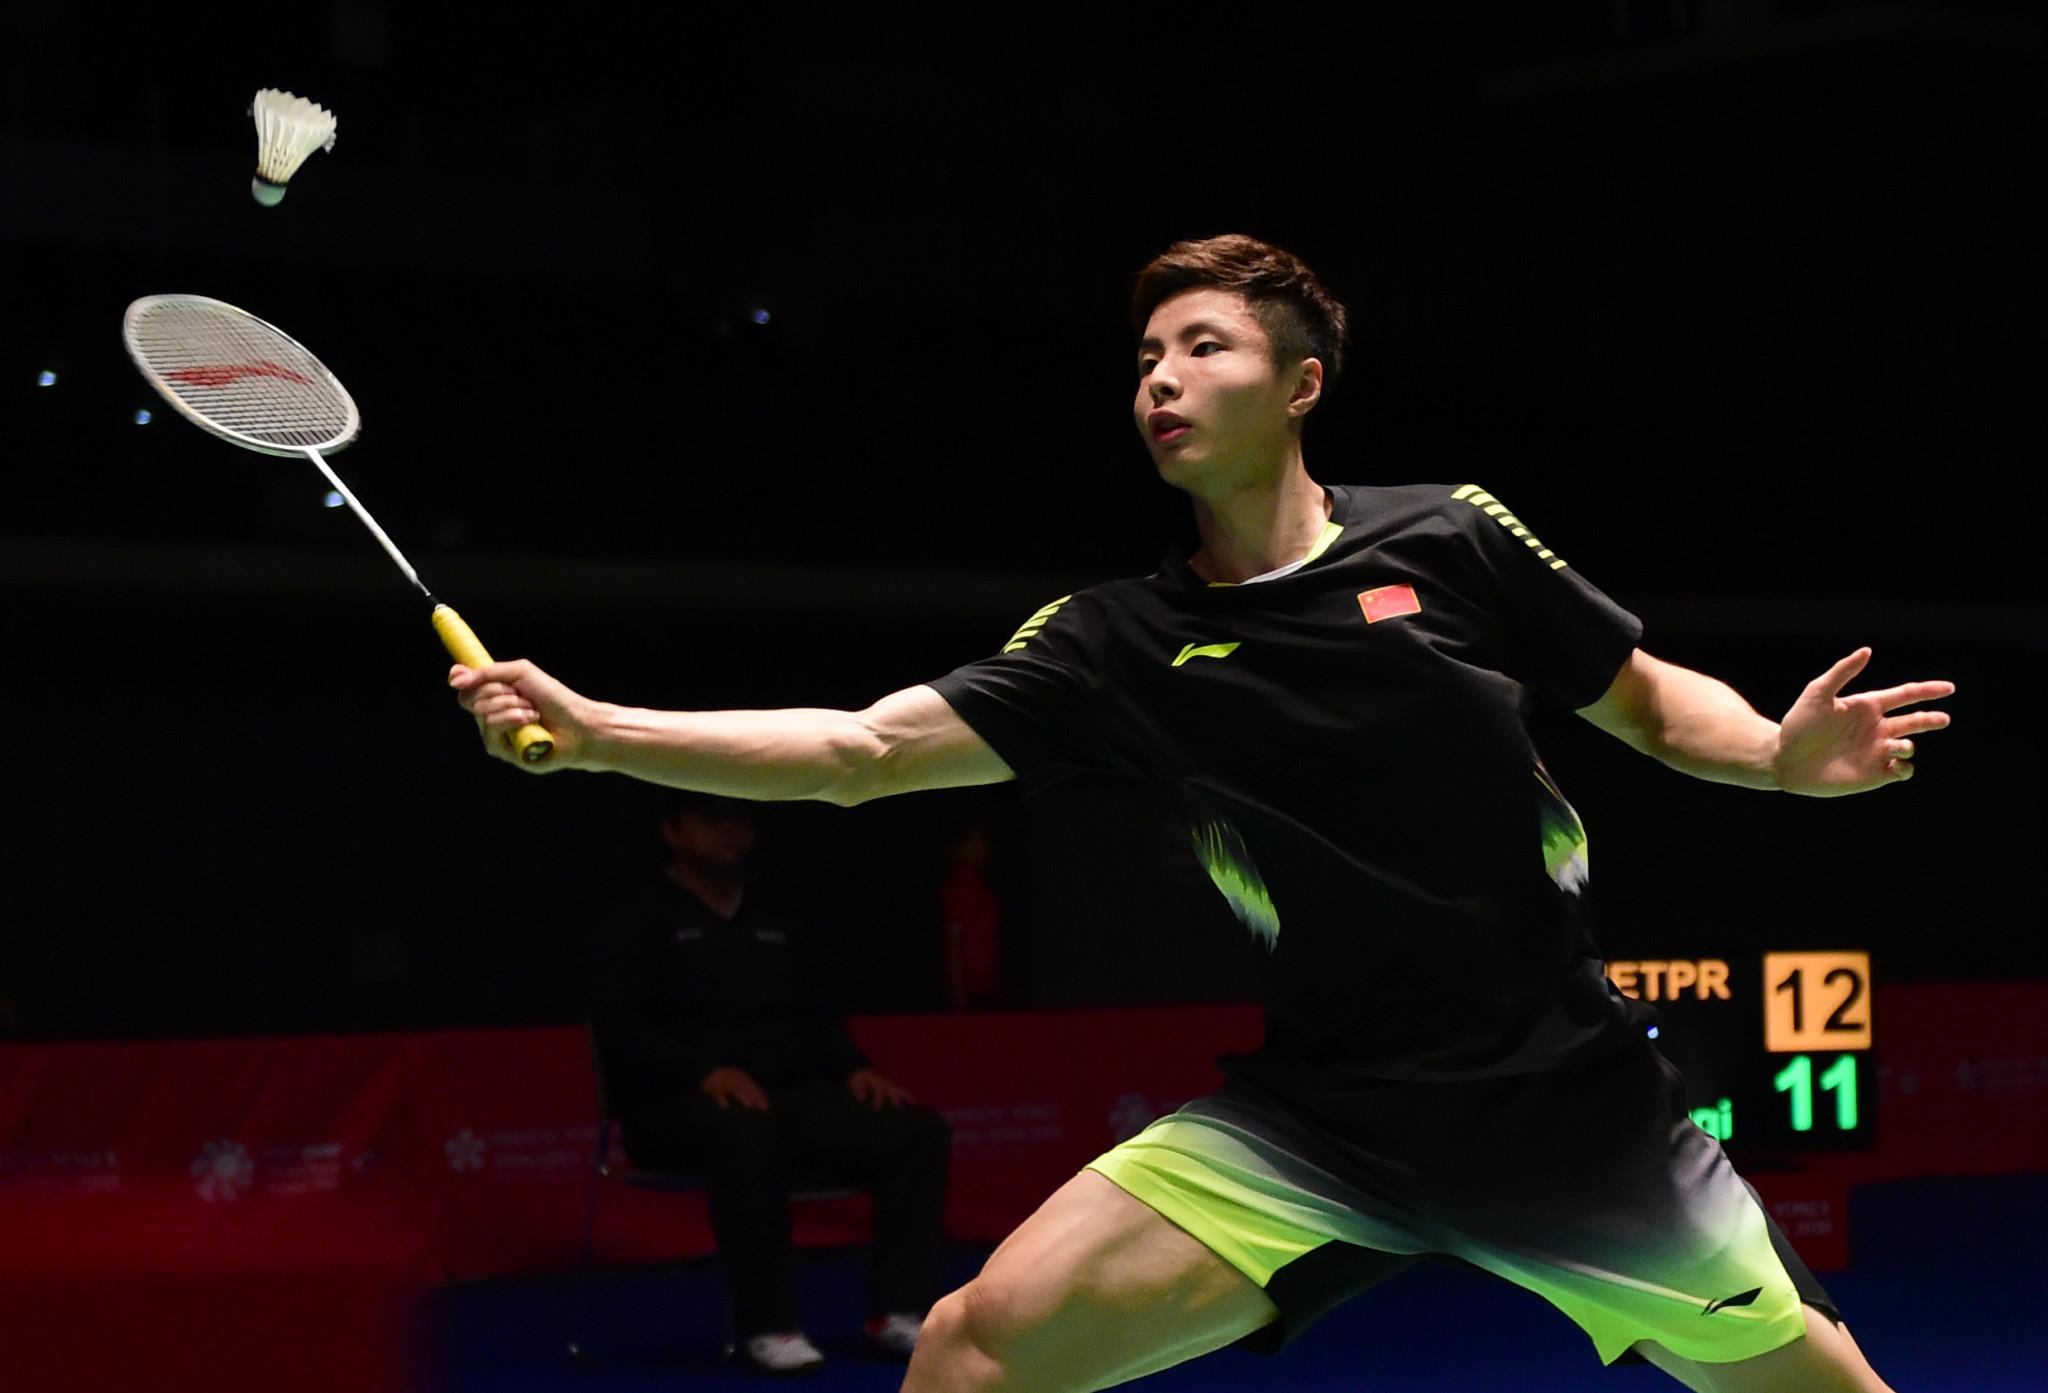 Home favourite Shi books place in BWF China Open semi-finals